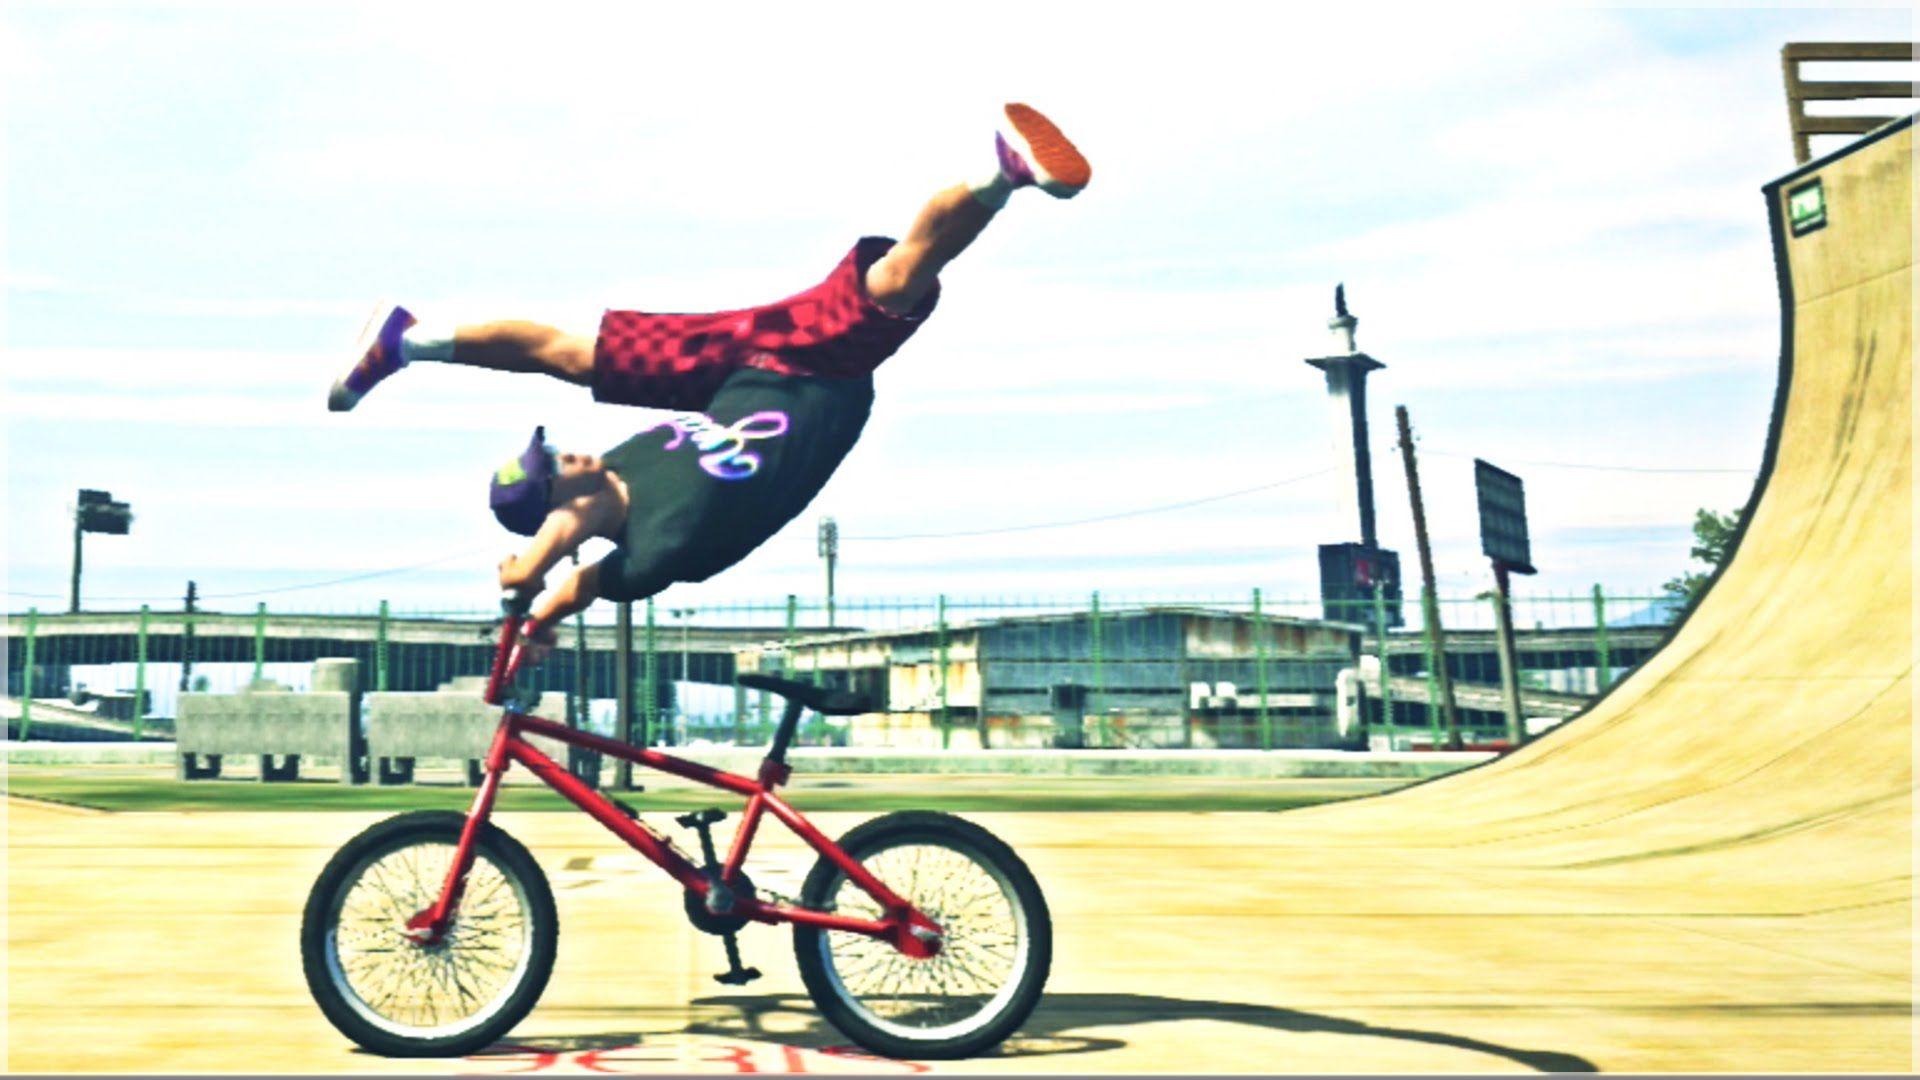 Gta 5 Bmx Freestyle 2 Gta V Bmx Stunts Montage Youtube Bmx